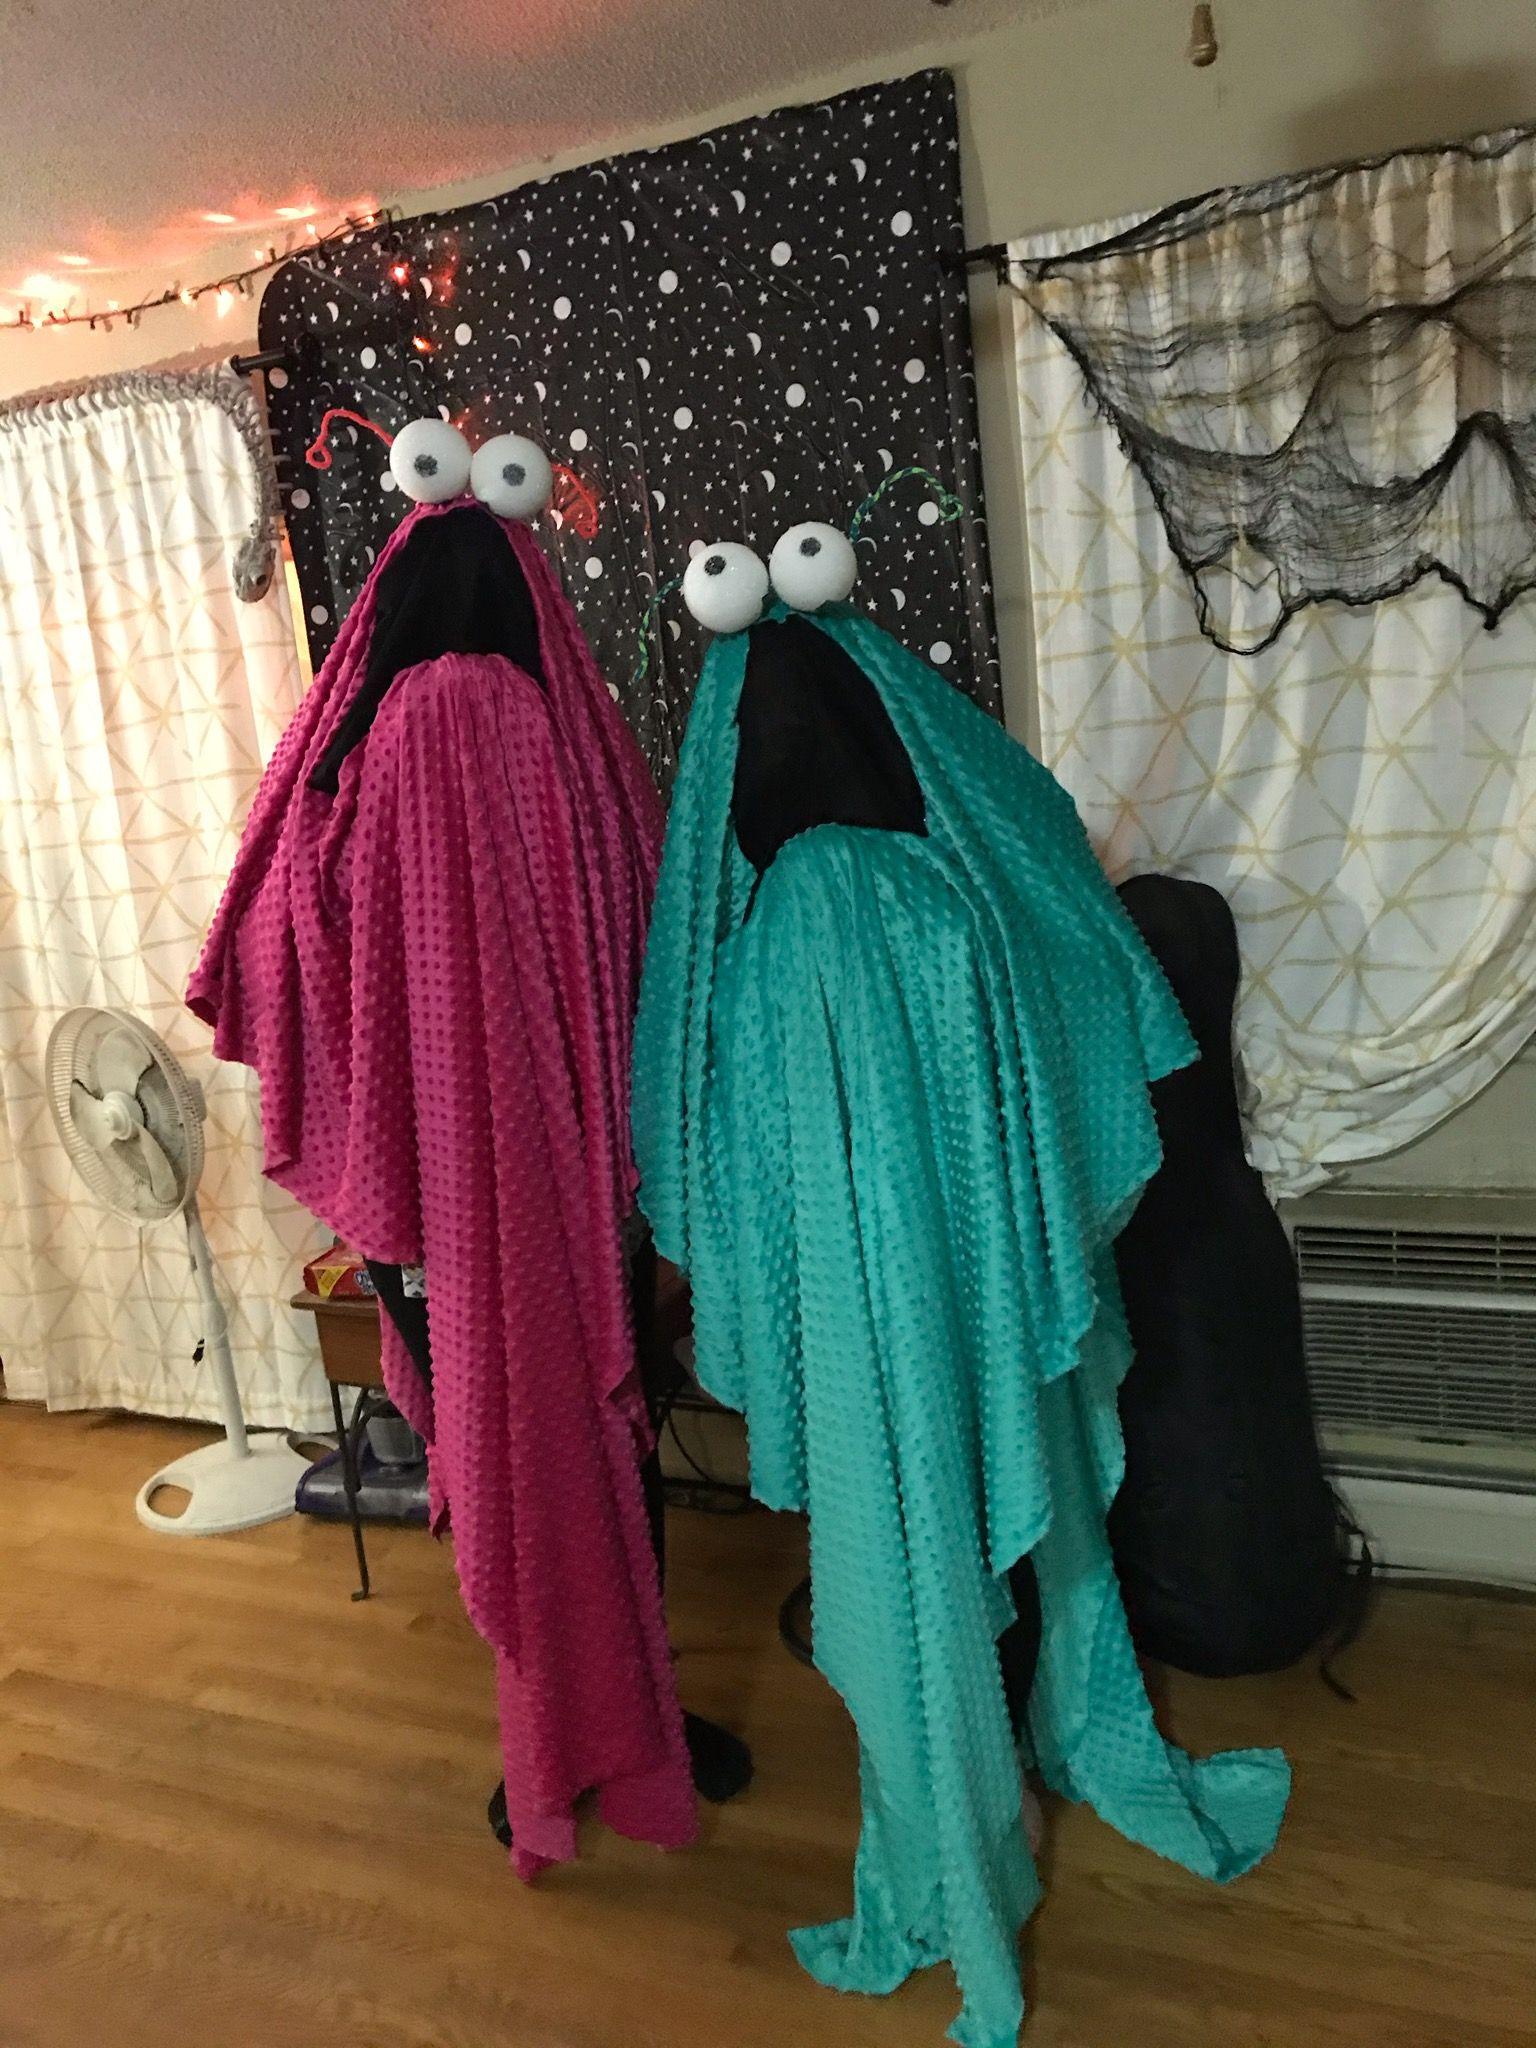 Costume cooostuuume yip yip yip yip yip costumes